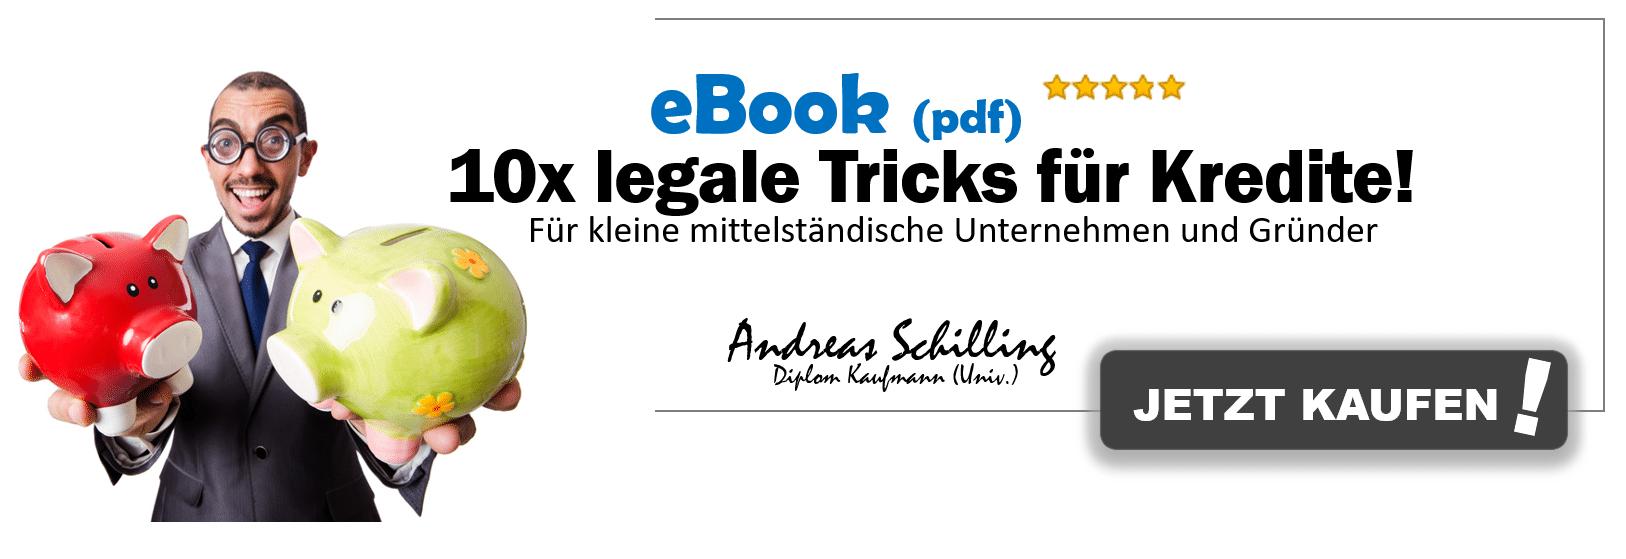 Firmenkredit, Firmenkredit schufafrei und alternative Finanzierungen – 10 legale Tricks